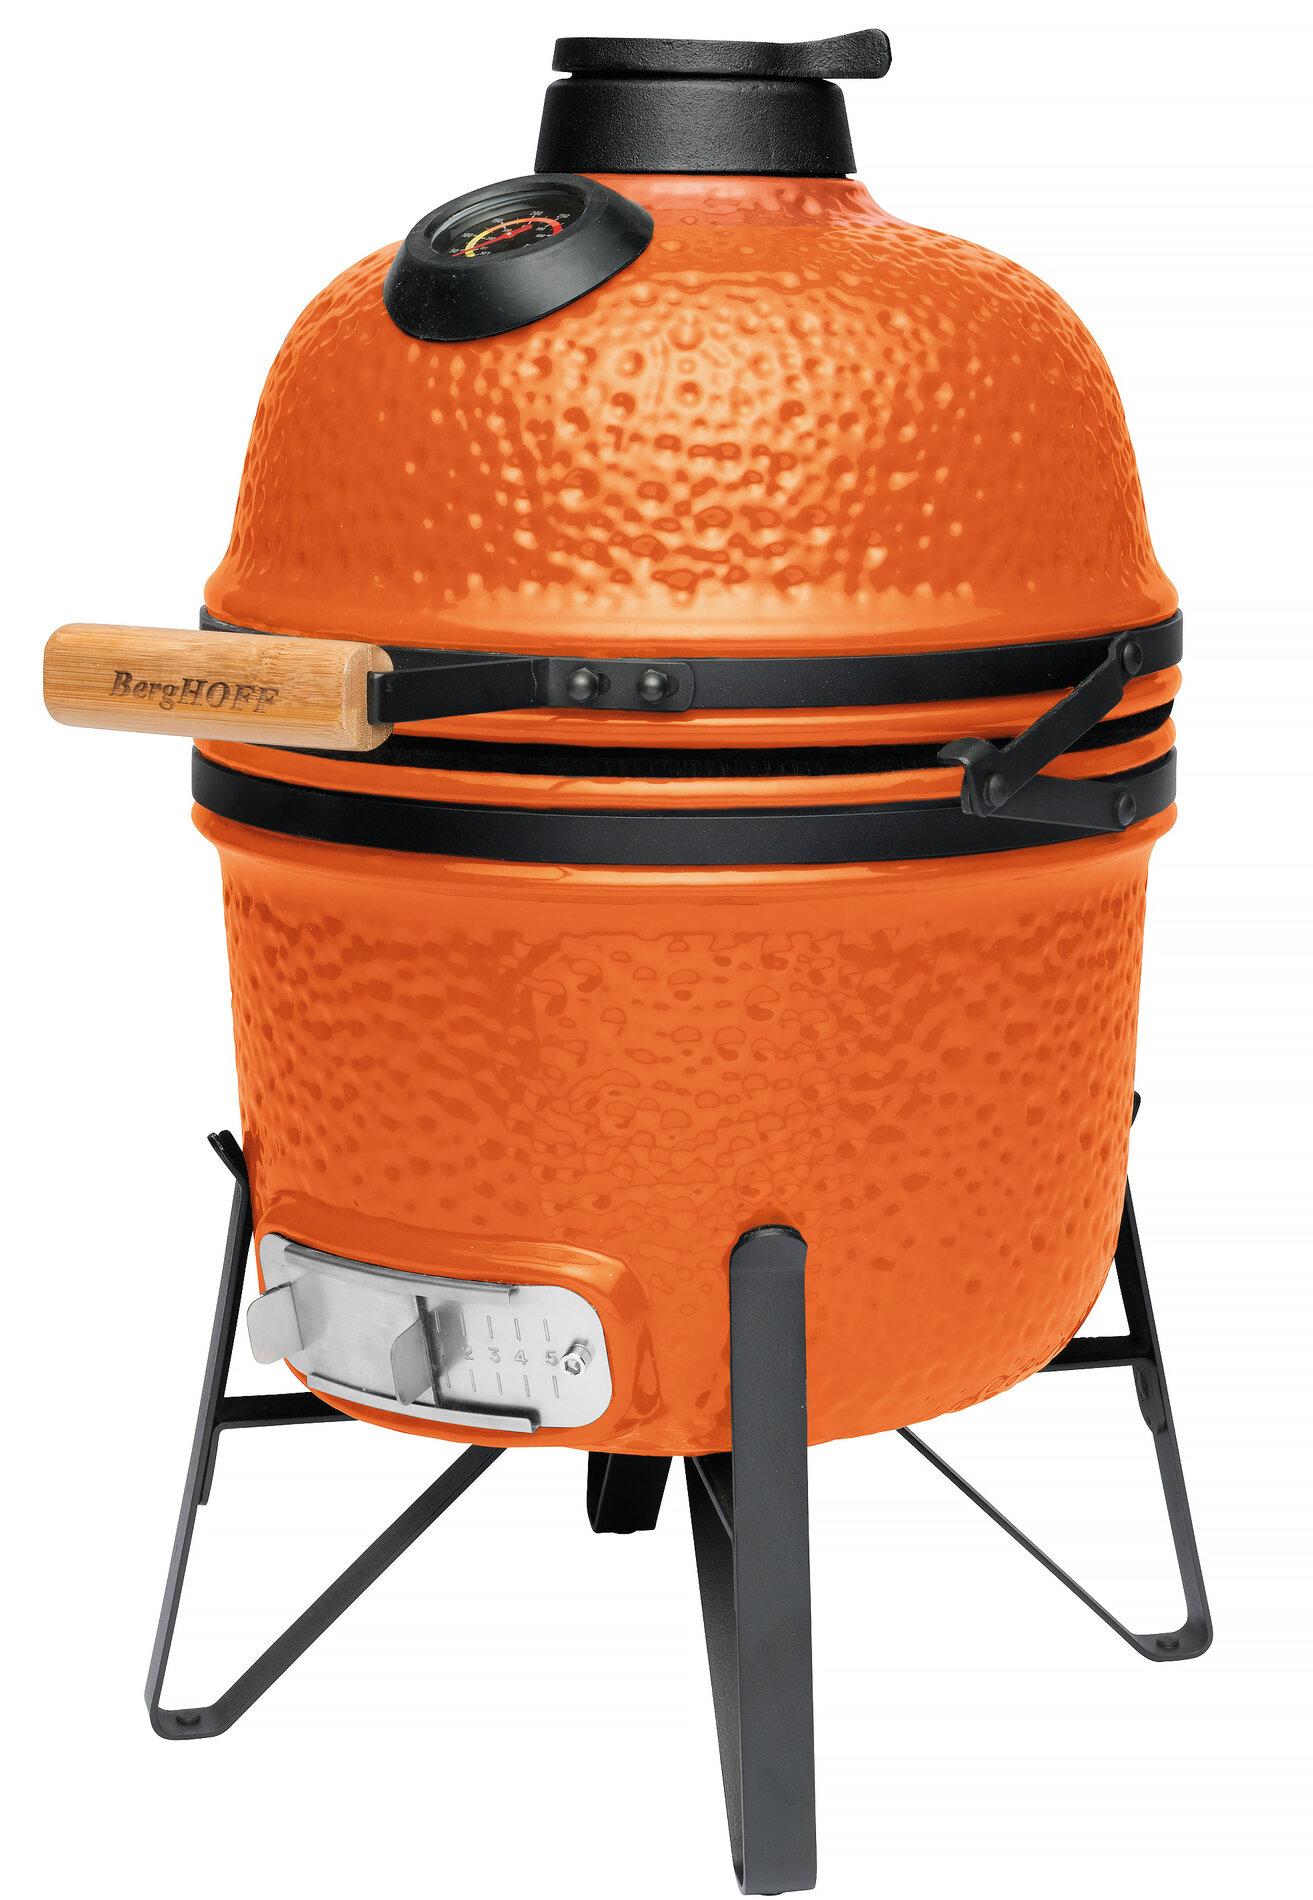 Berghoff 13 kamado charcoal grill reviews wayfair dailygadgetfo Images